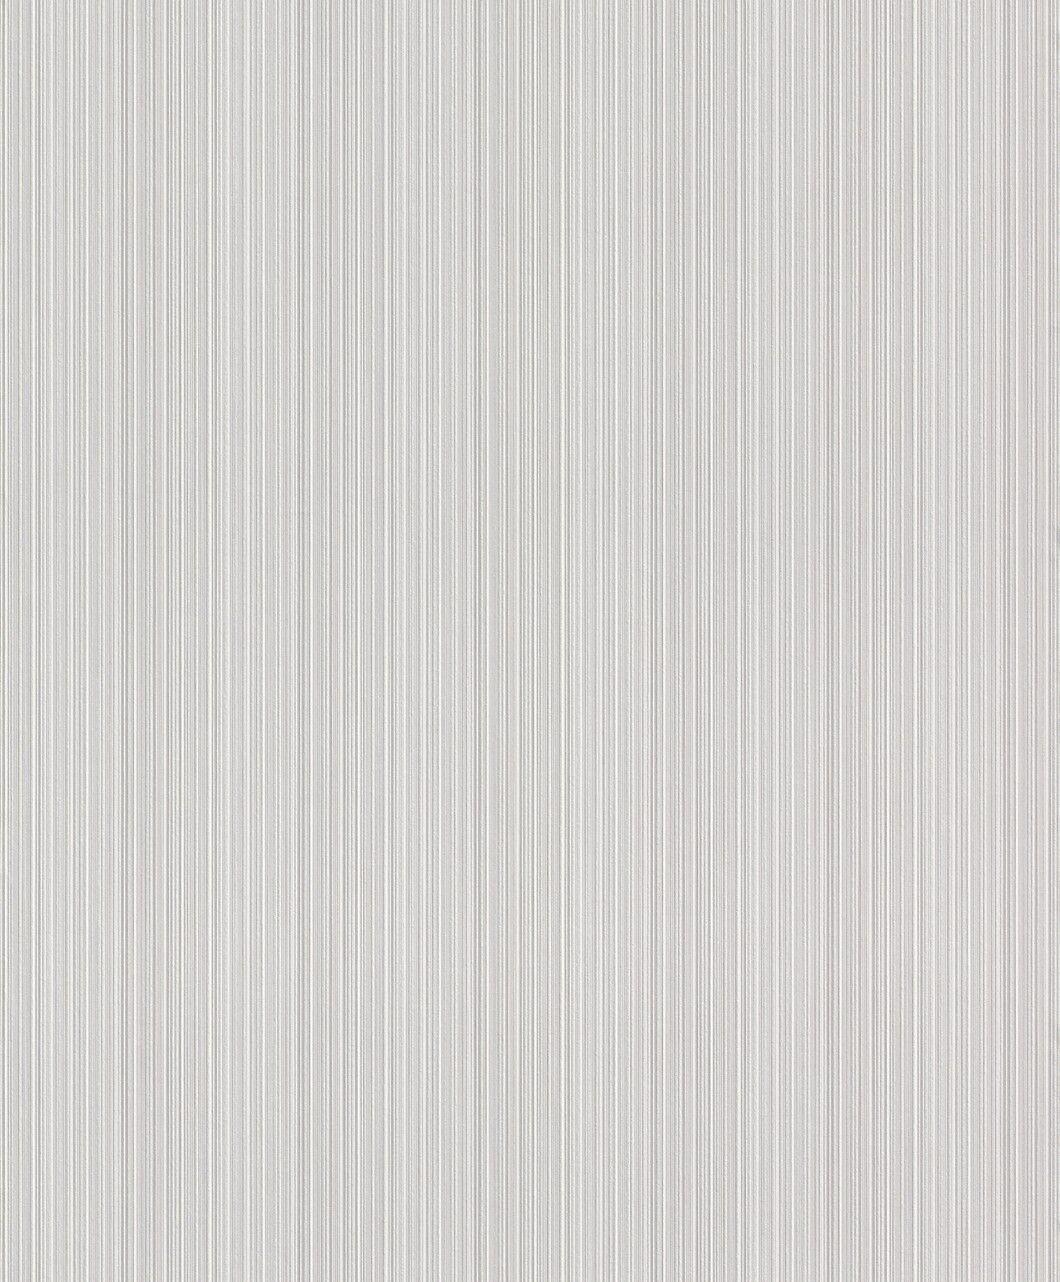 Rasch Non Woven Textured Wavy Lines Red Grey White Cream Waves Wallpaper 415421